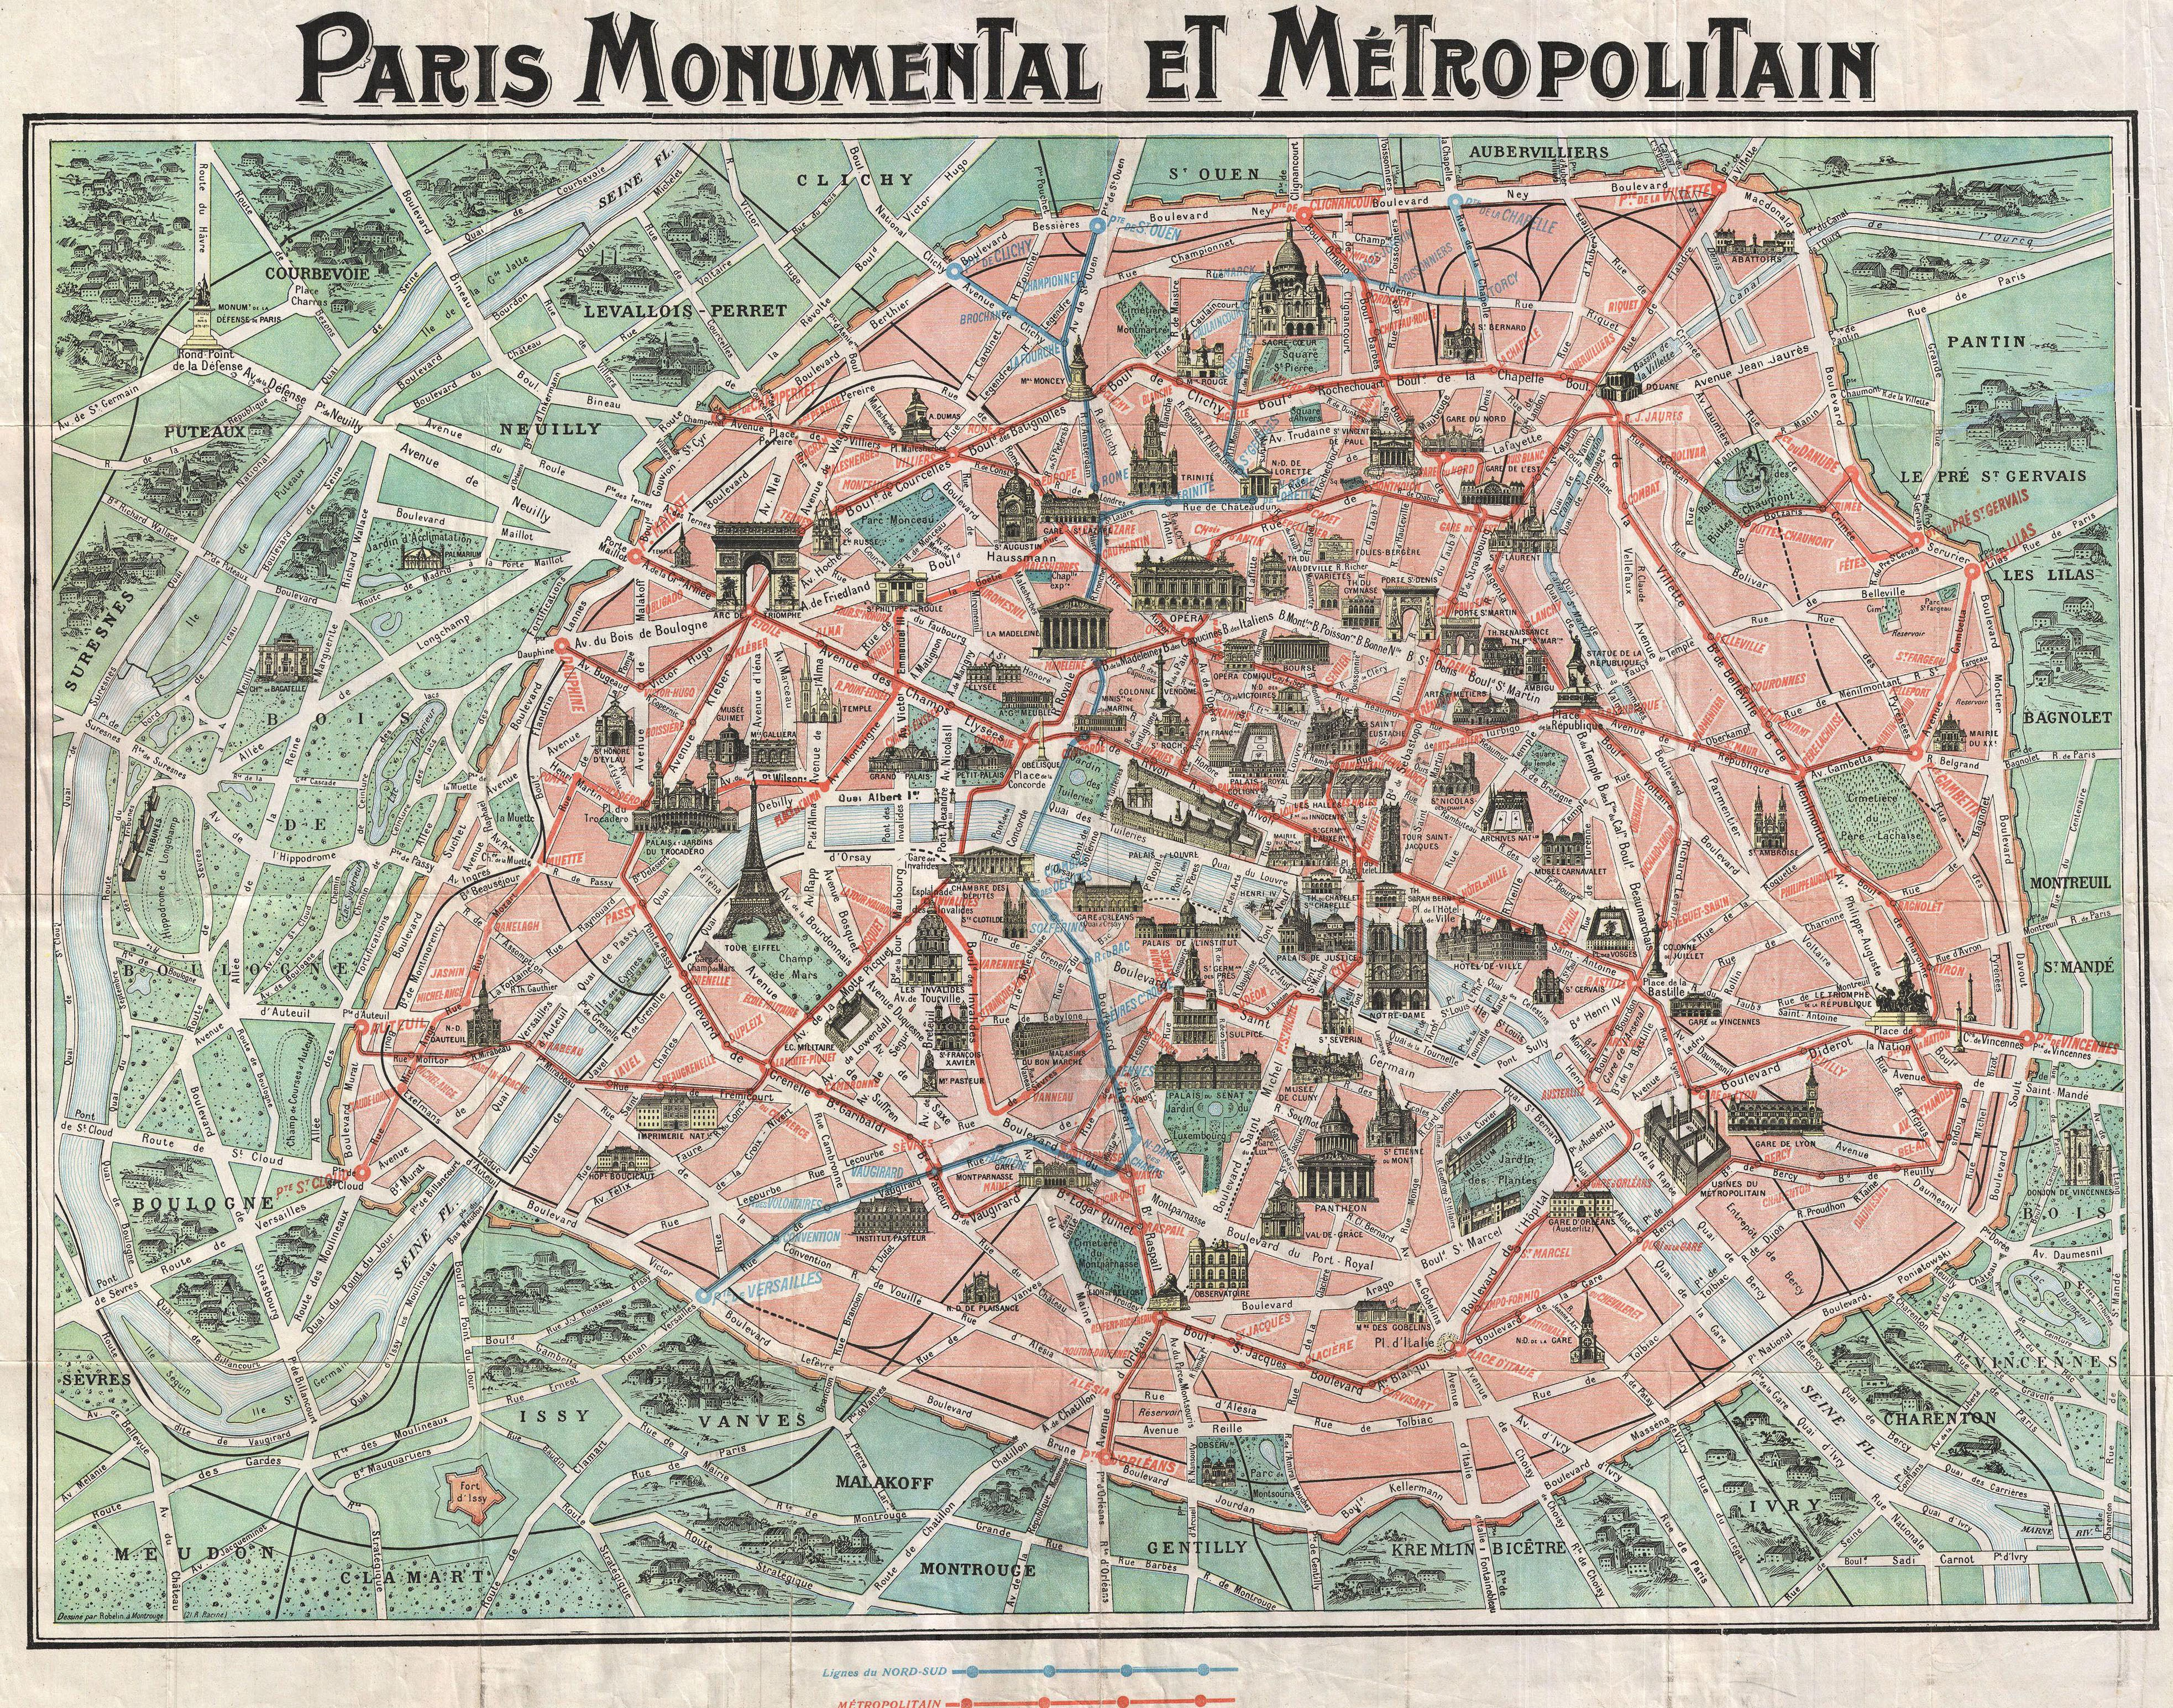 20 Free Vintage Map Printable Images | Remodelaholic #art - Free Printable Map Of Paris